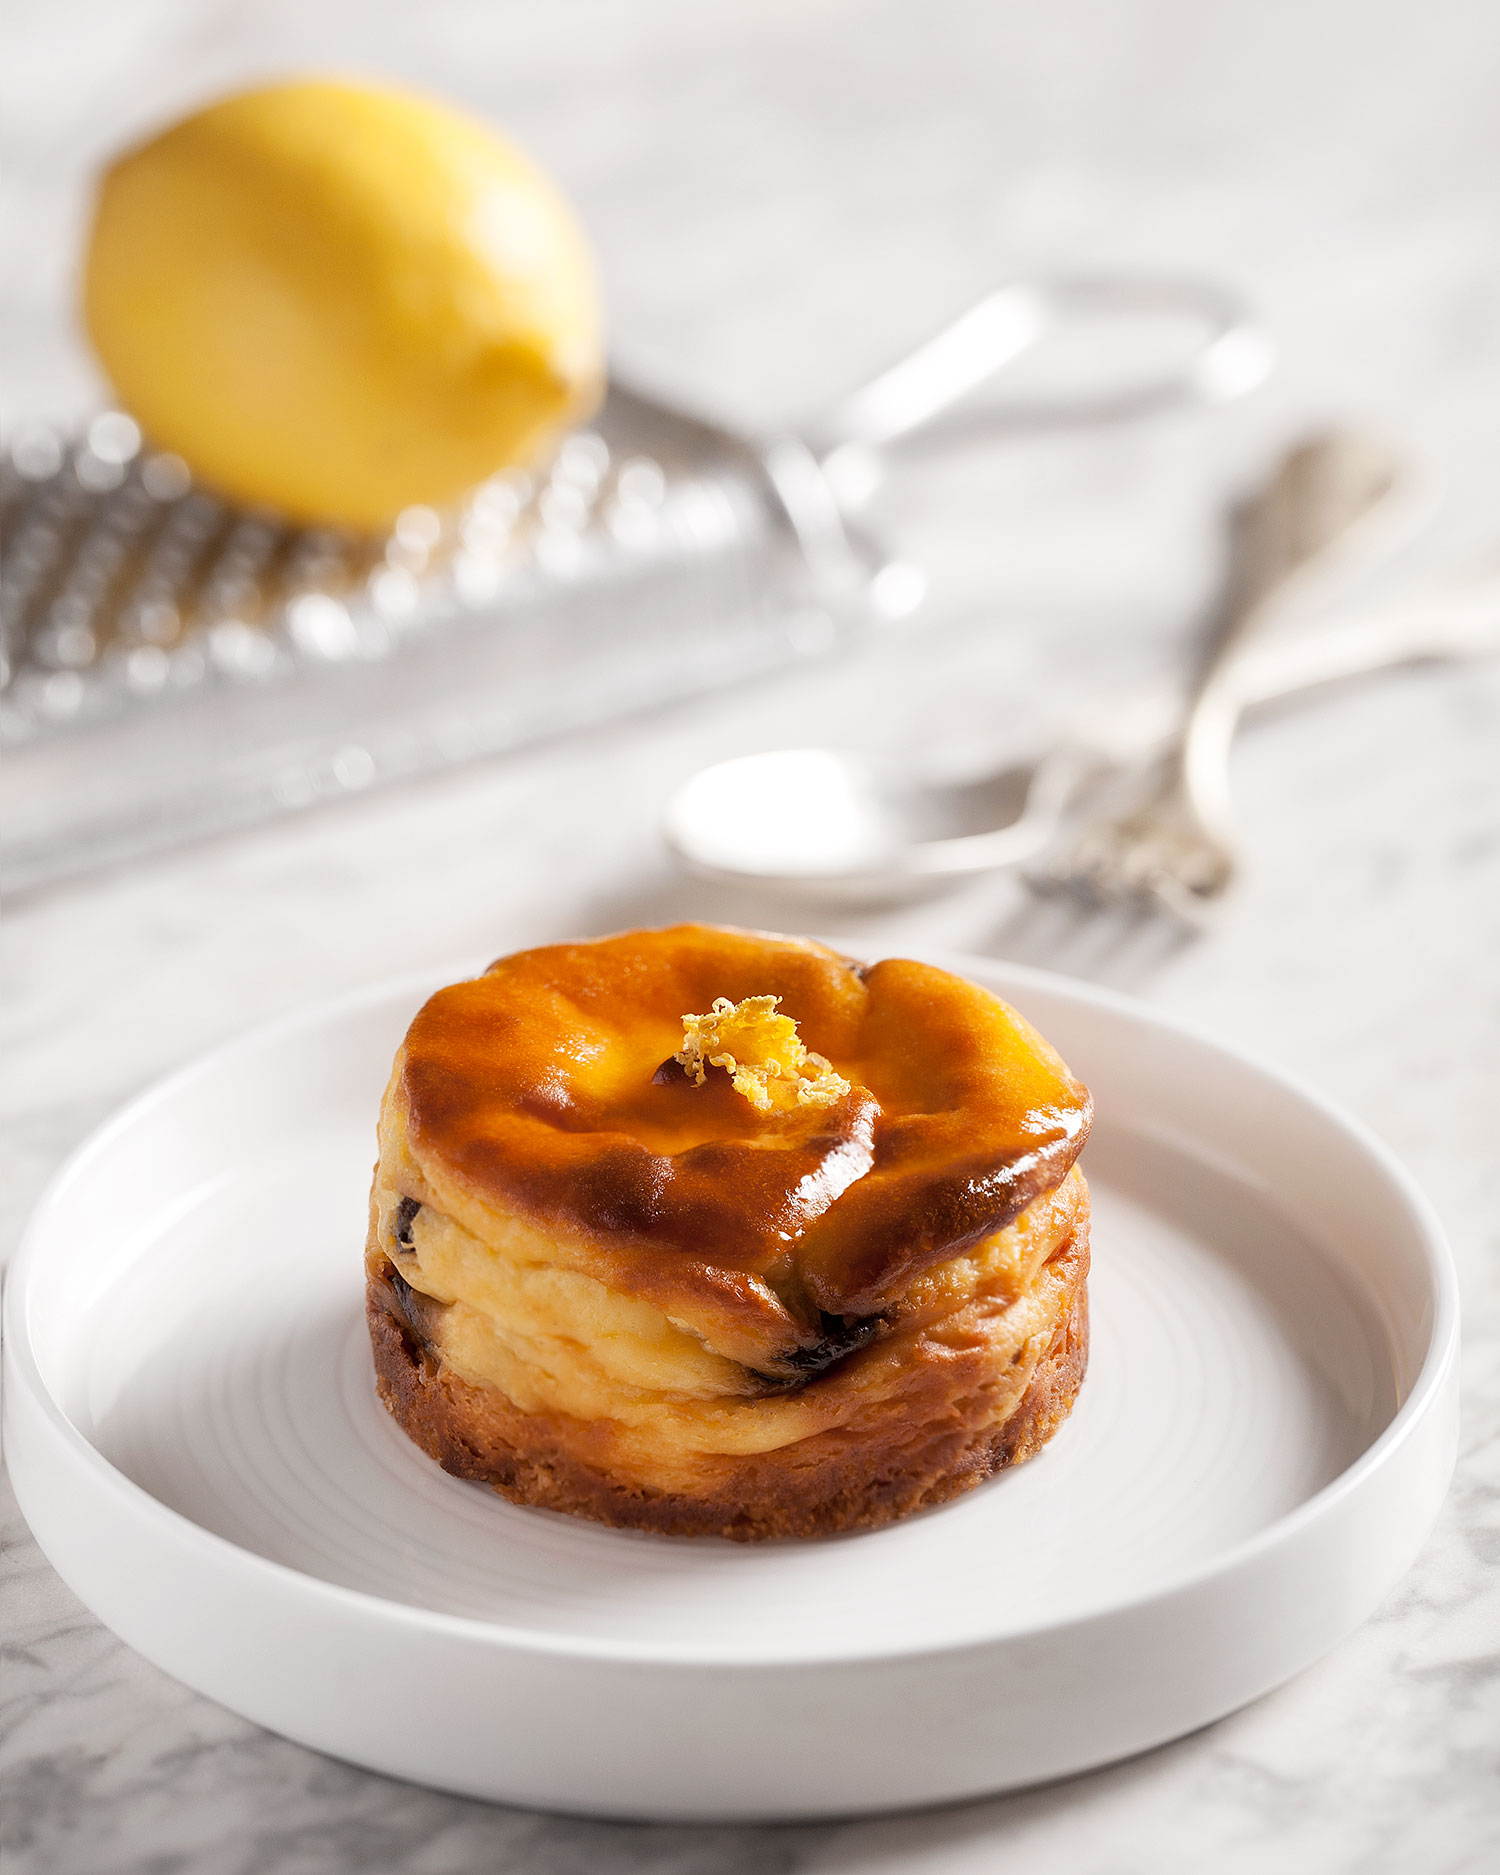 corina-landa-food-photography-fotografia-gastronomica-55.jpg